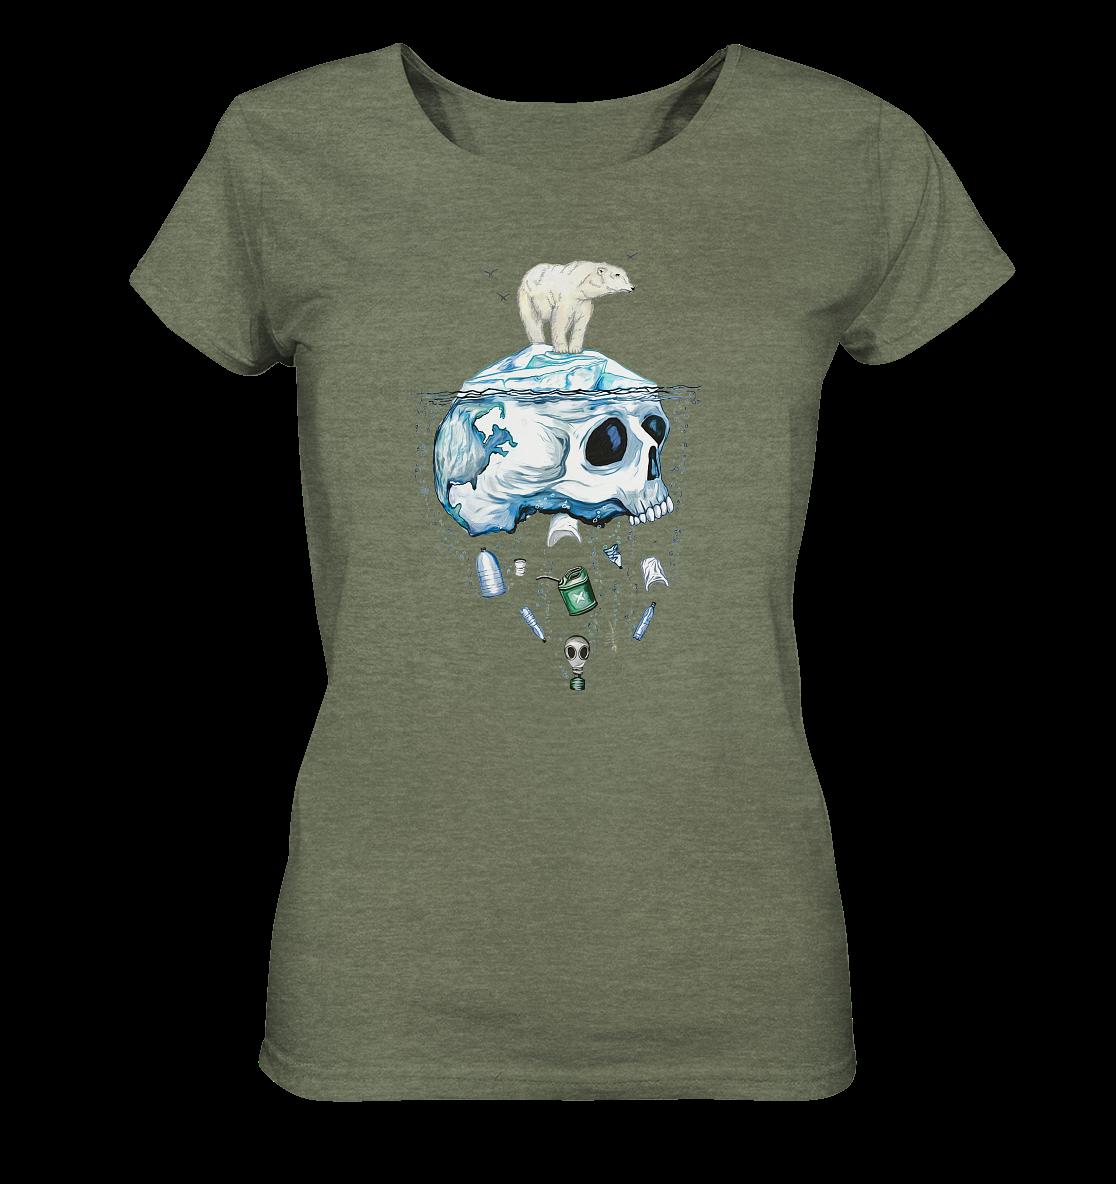 front-ladies-organic-shirt-meliert-616b52-1116x.png